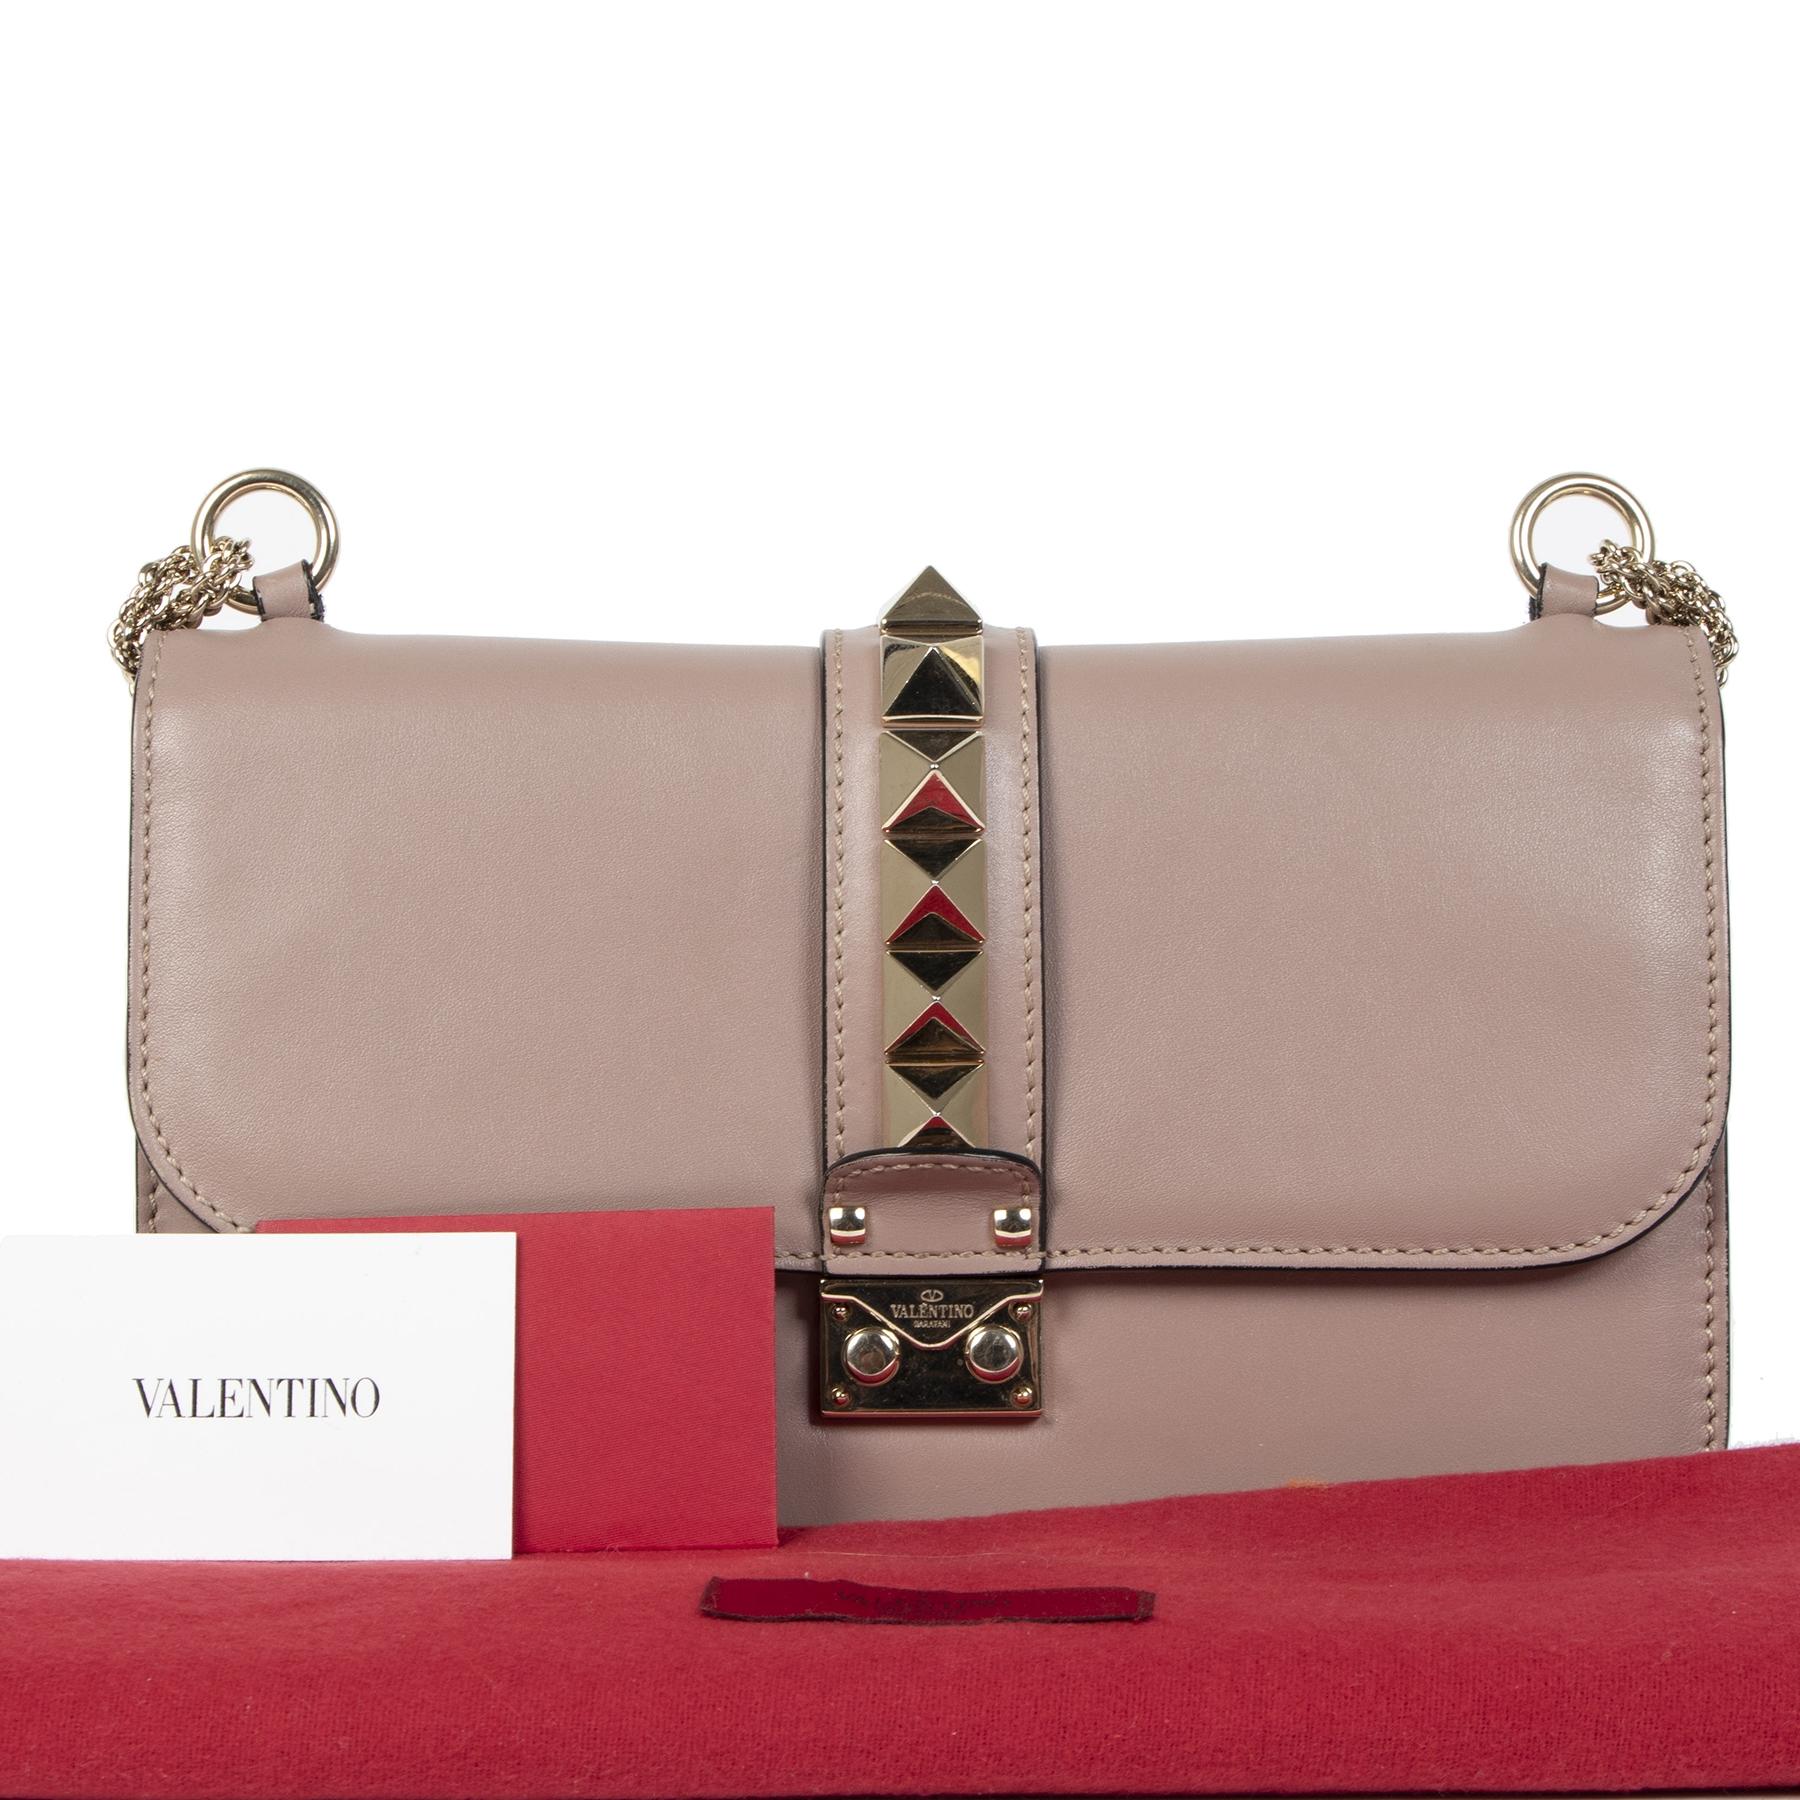 Authentique seconde-main vintage Valentino Lavender Lock Medium Shoulder Bag achète en ligne webshop LabelLOV